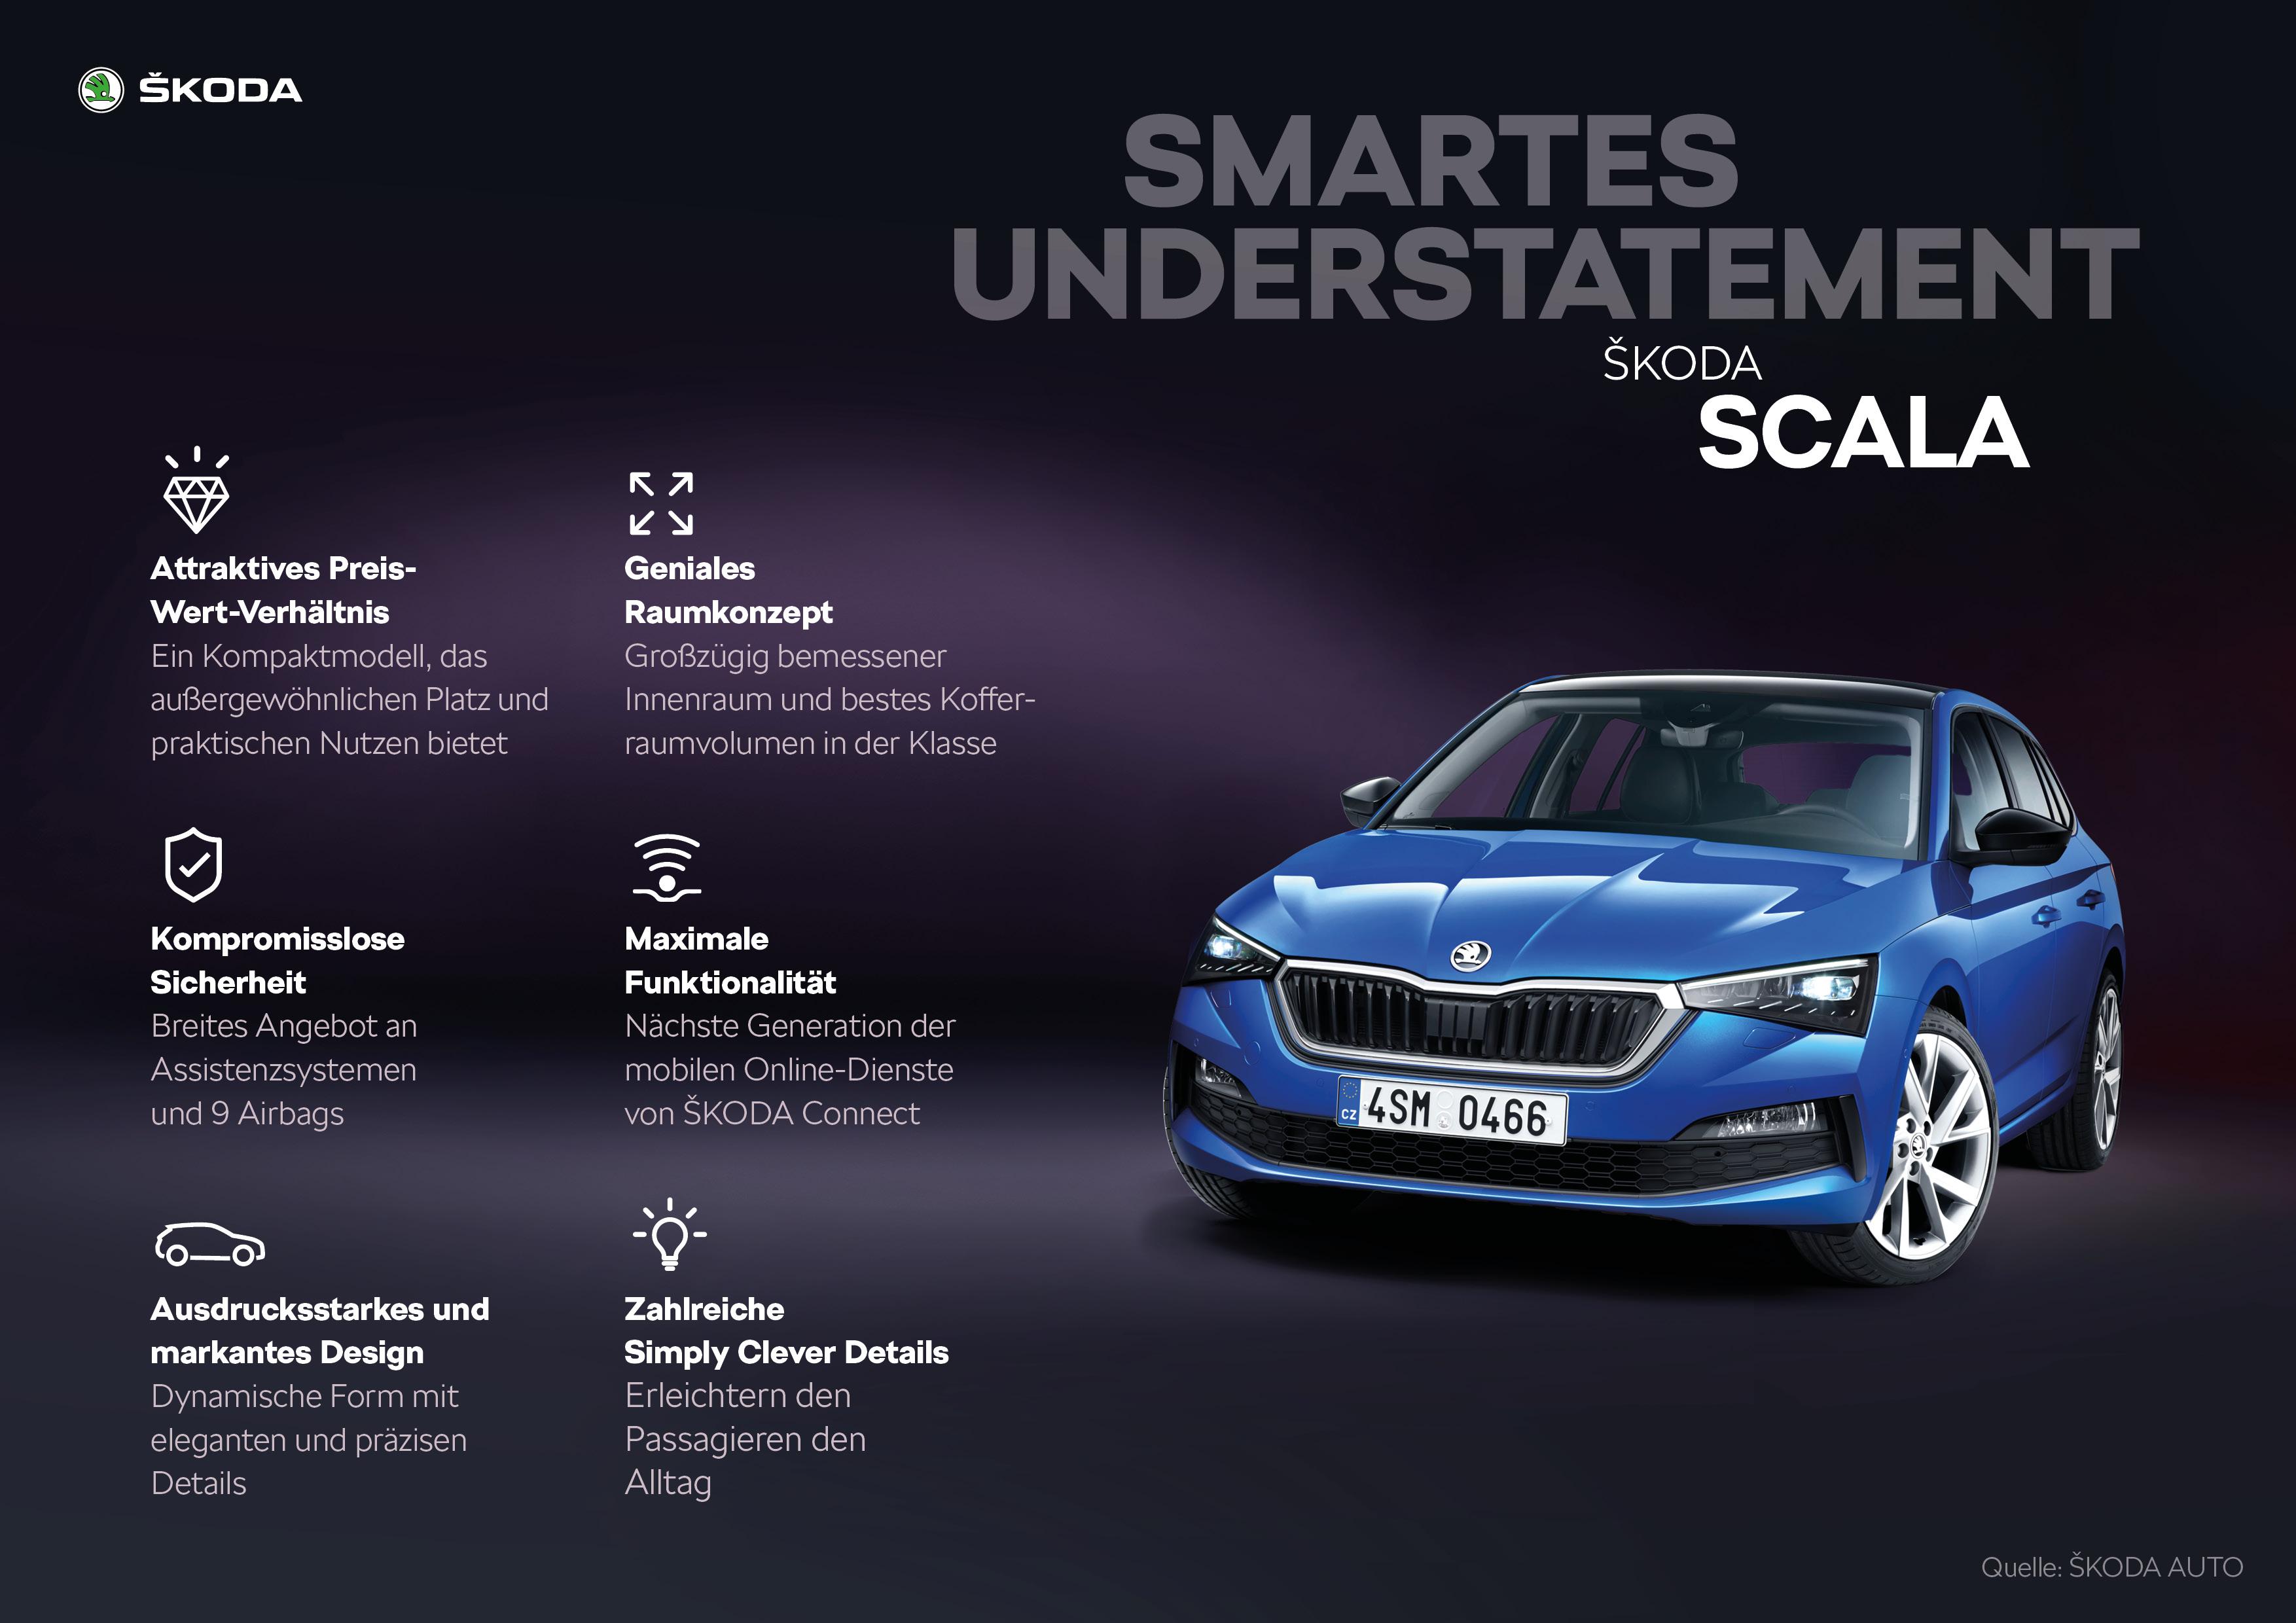 SCALA_Smartes_Understandment